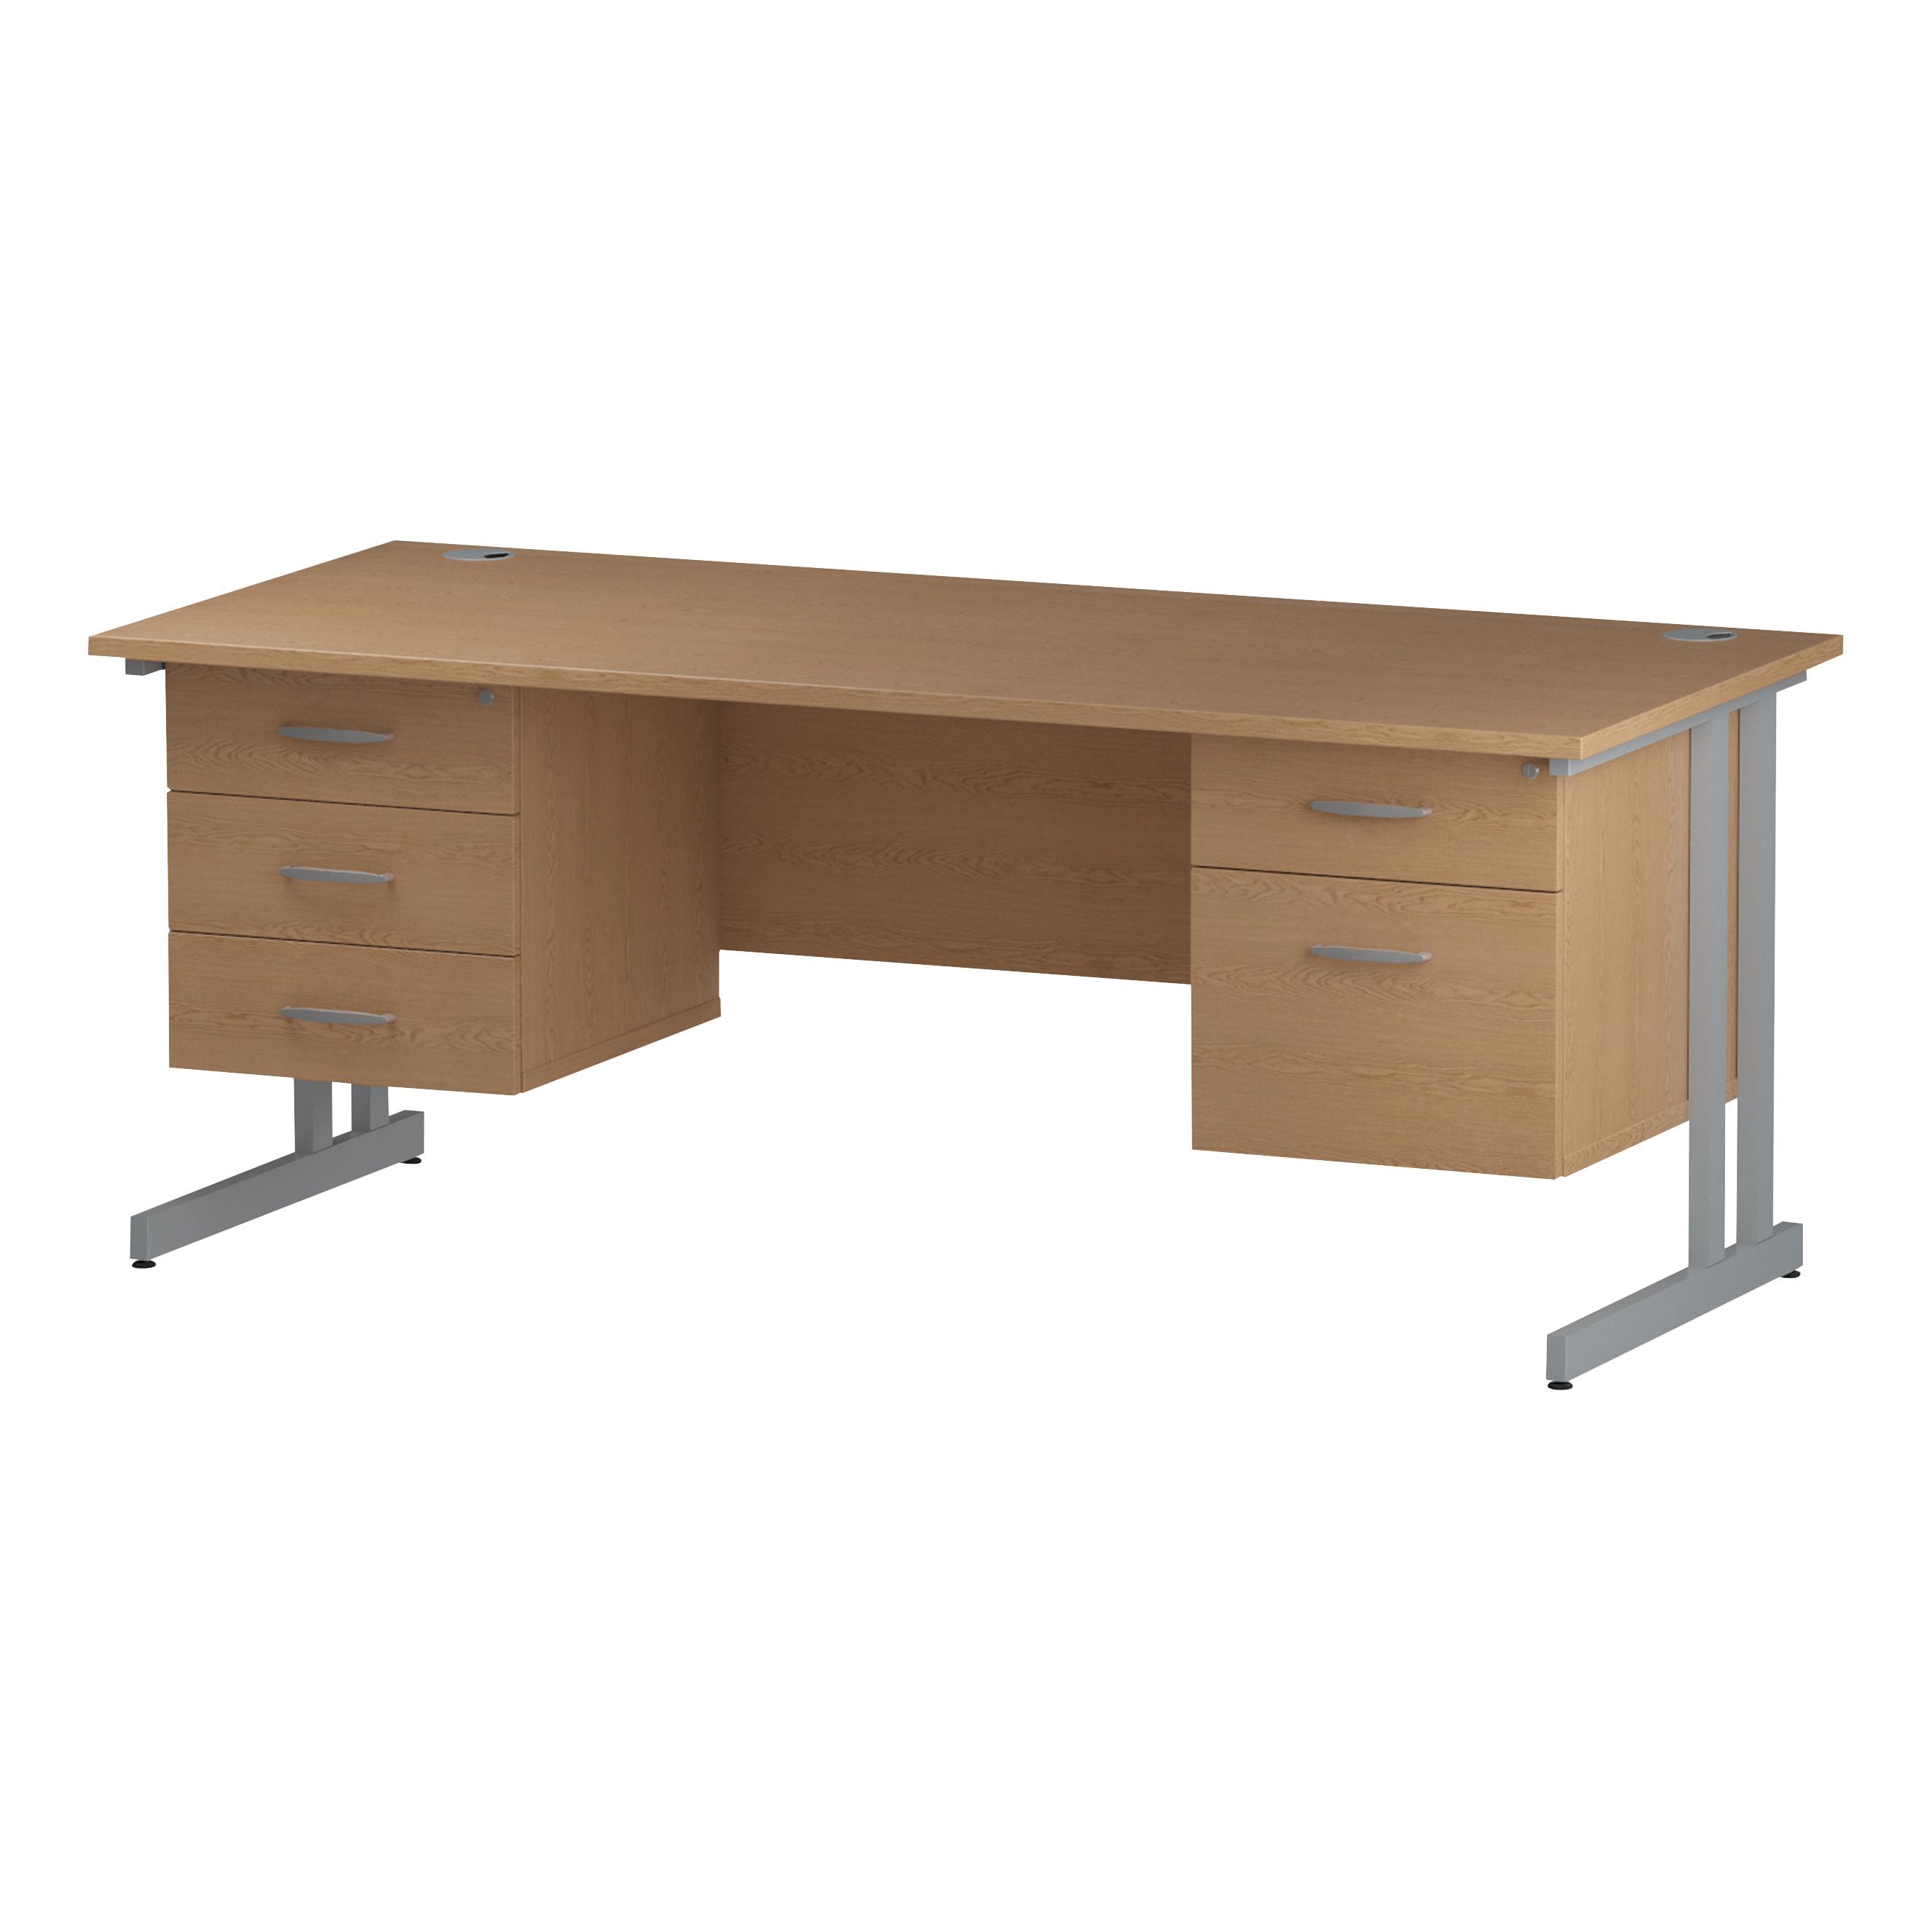 Trexus Rectangular Desk Silver Cantilever Leg 1800x800mm Double Fixed Ped 2&3 Drawers Oak Ref I002692